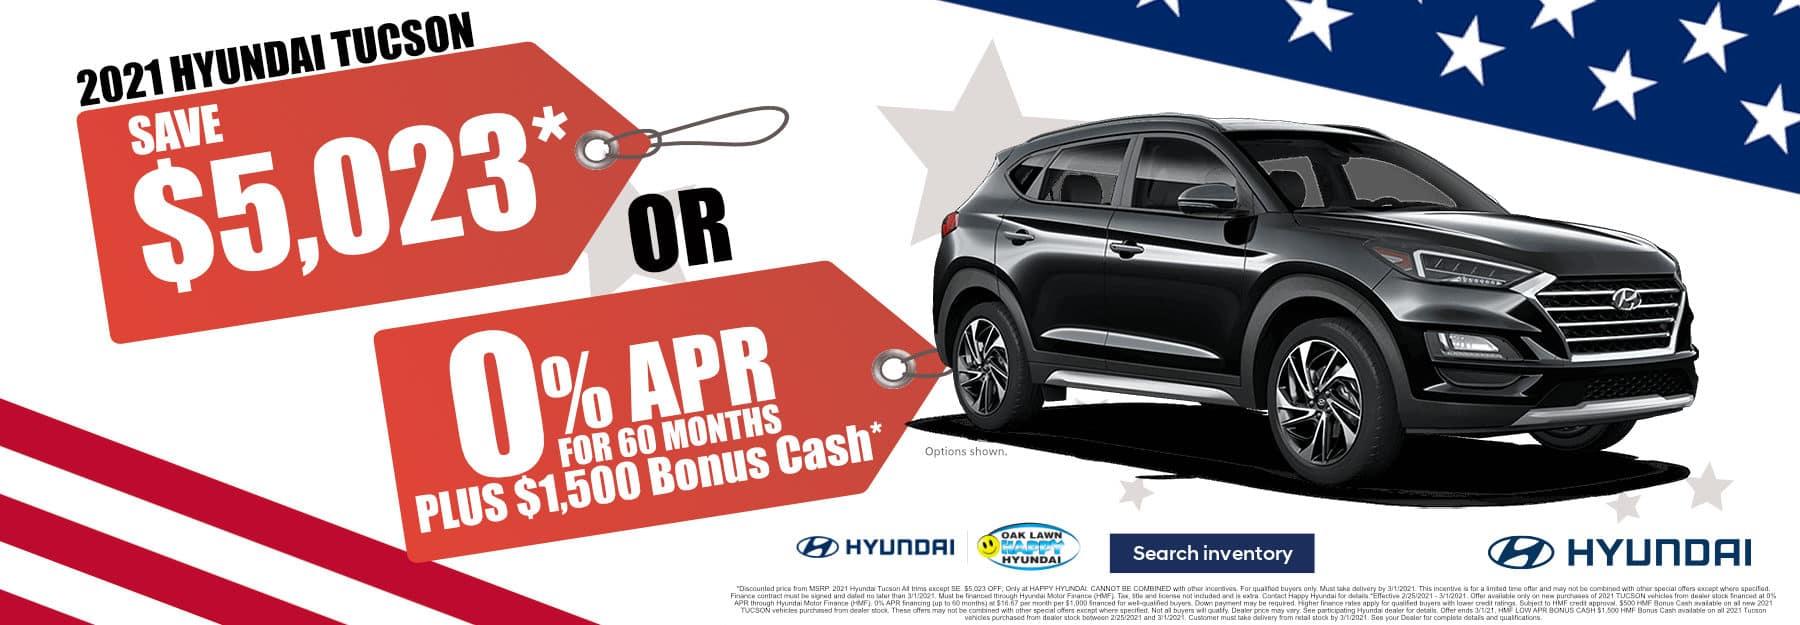 Revised_February_2021_MY21TUCSONWEB_Happy_Hyundai